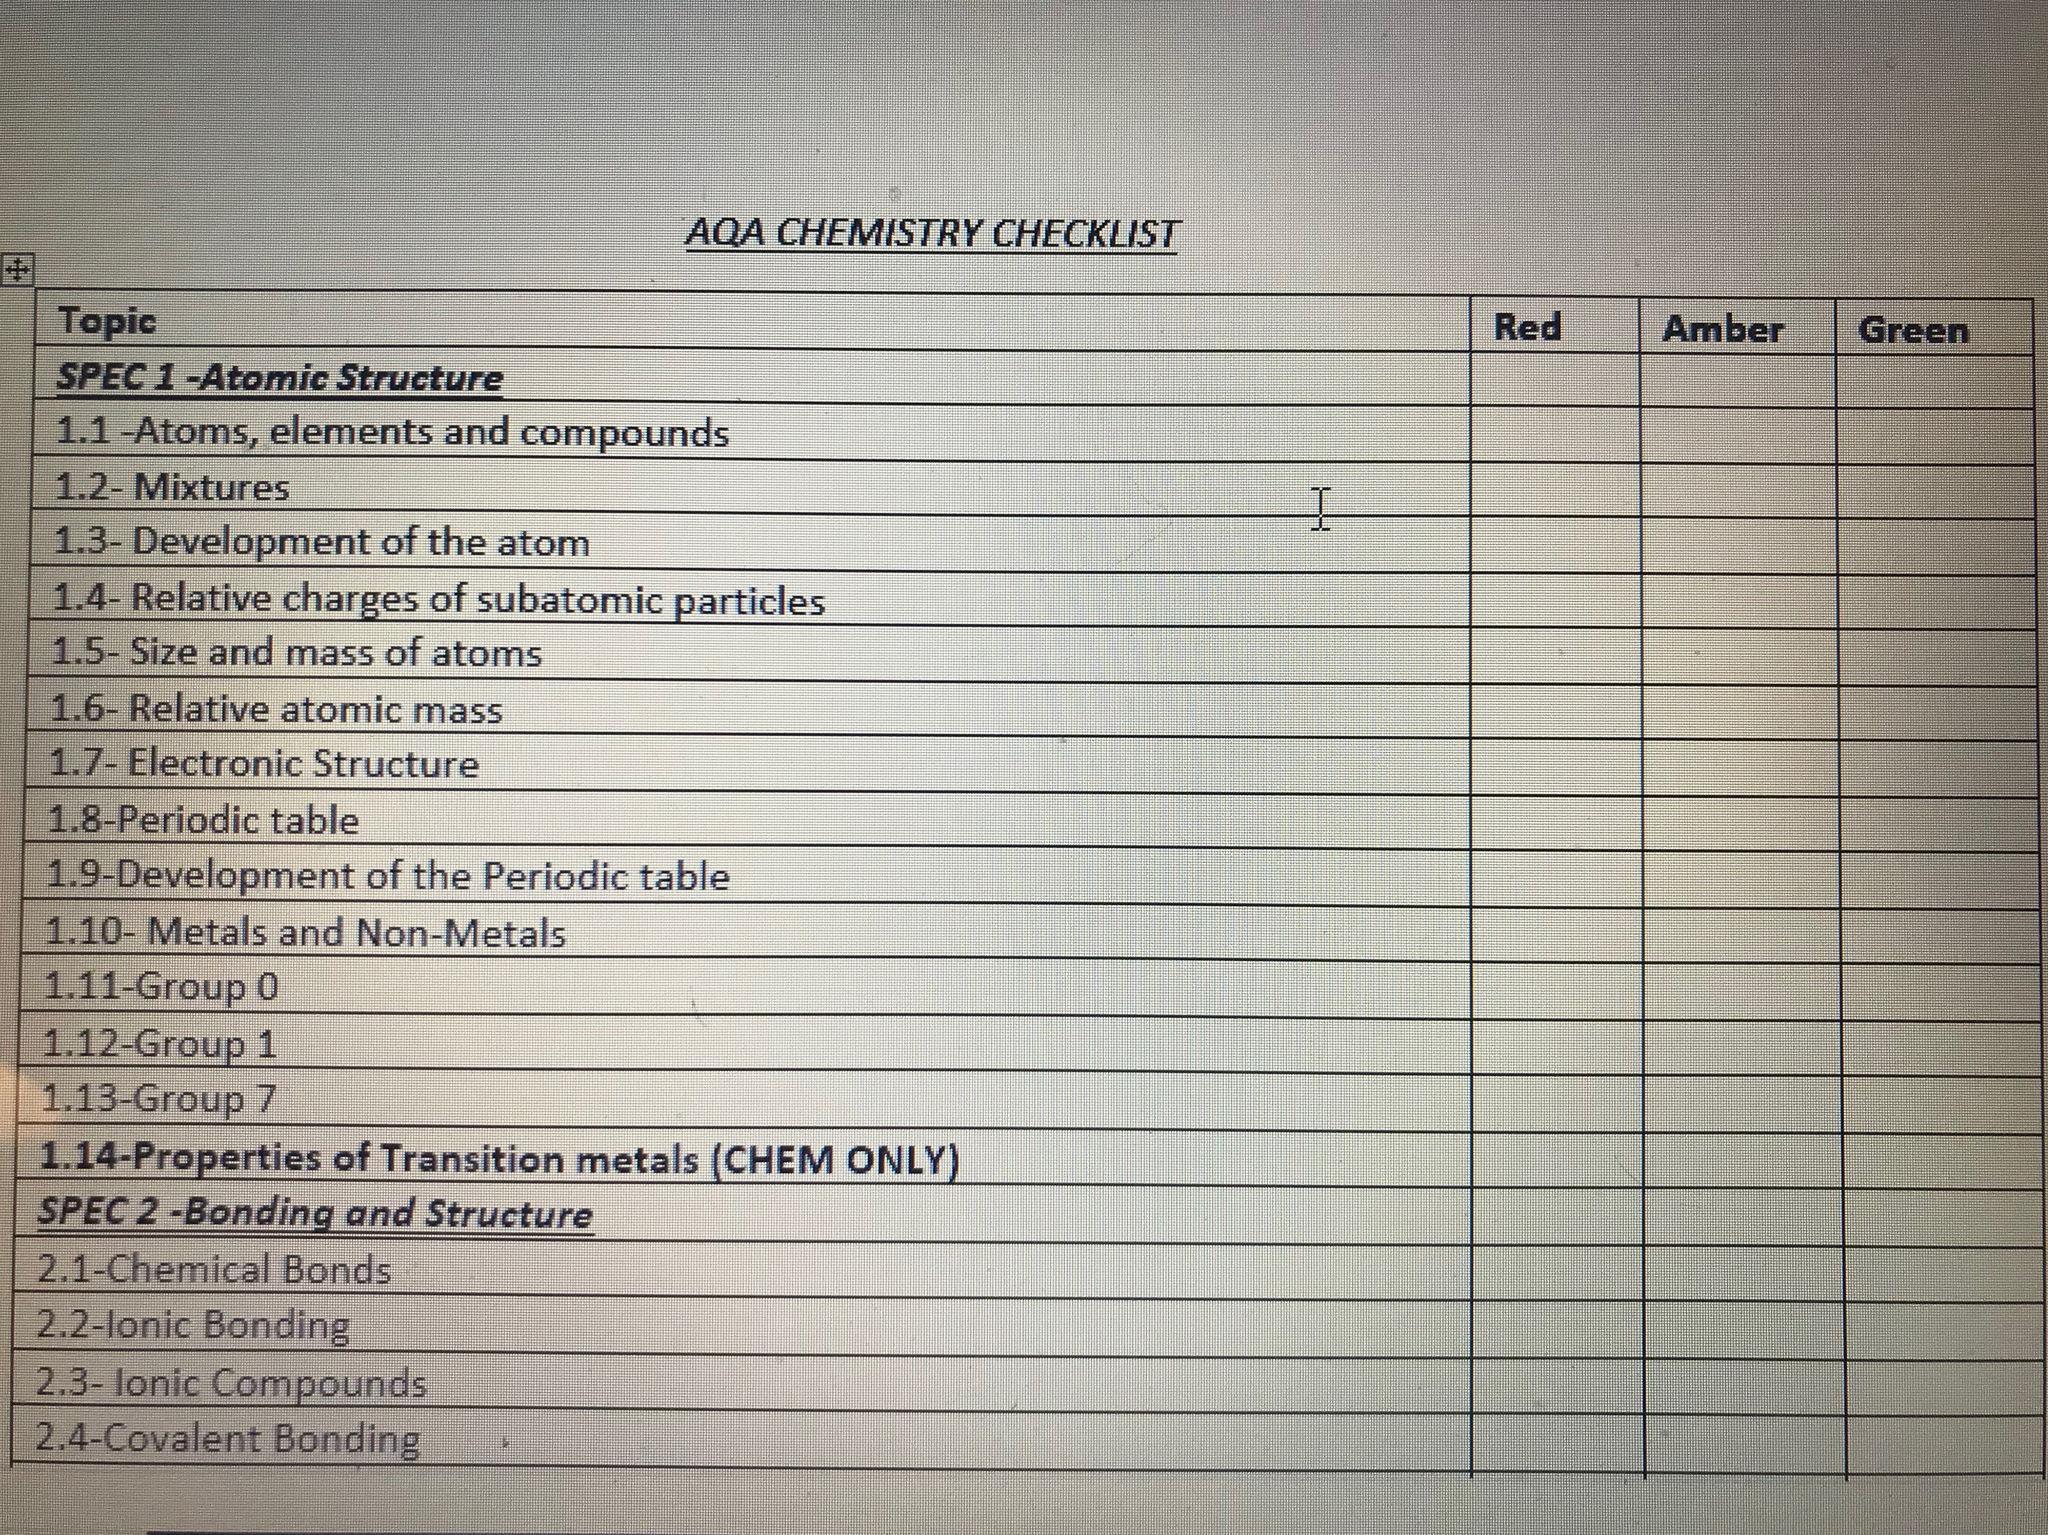 NEW AQA Chemistry checklist